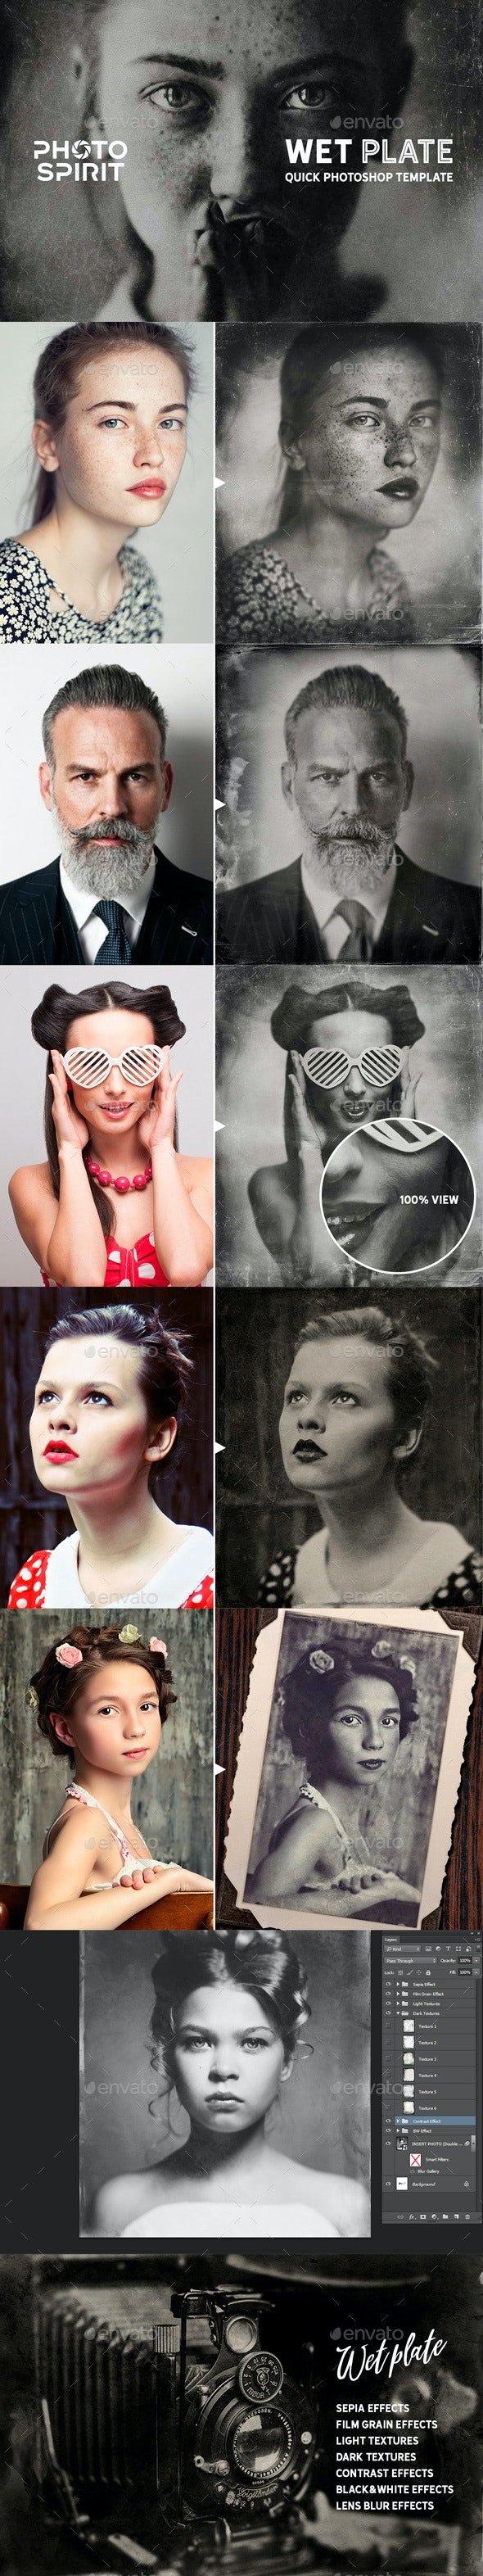 Wet Plate Photoshop Template PRO - Artistic Photo Templates